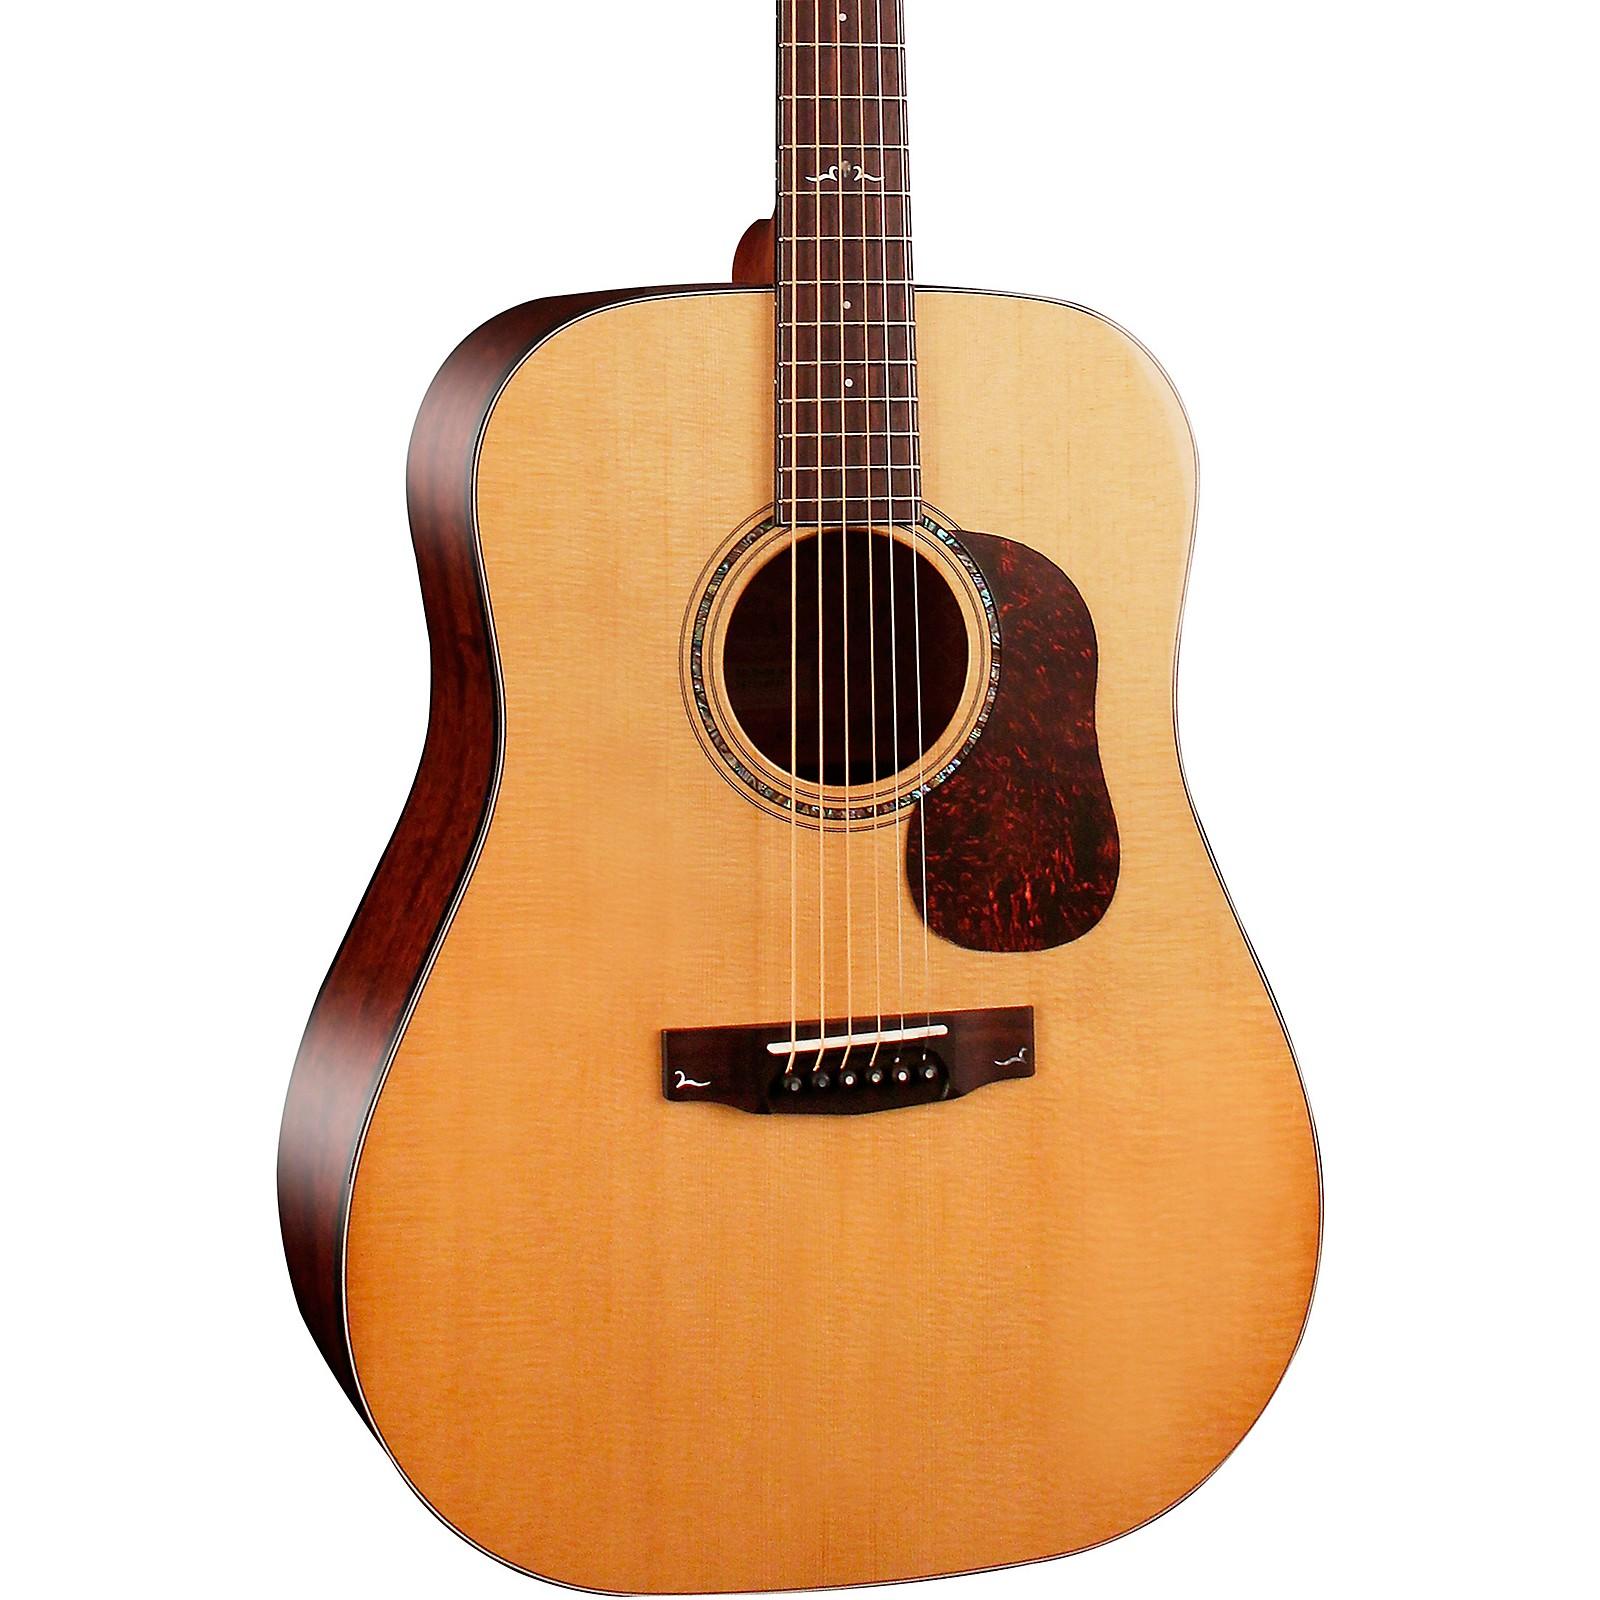 Cort Gold D6 Dreadnaught Acoustic Guitar